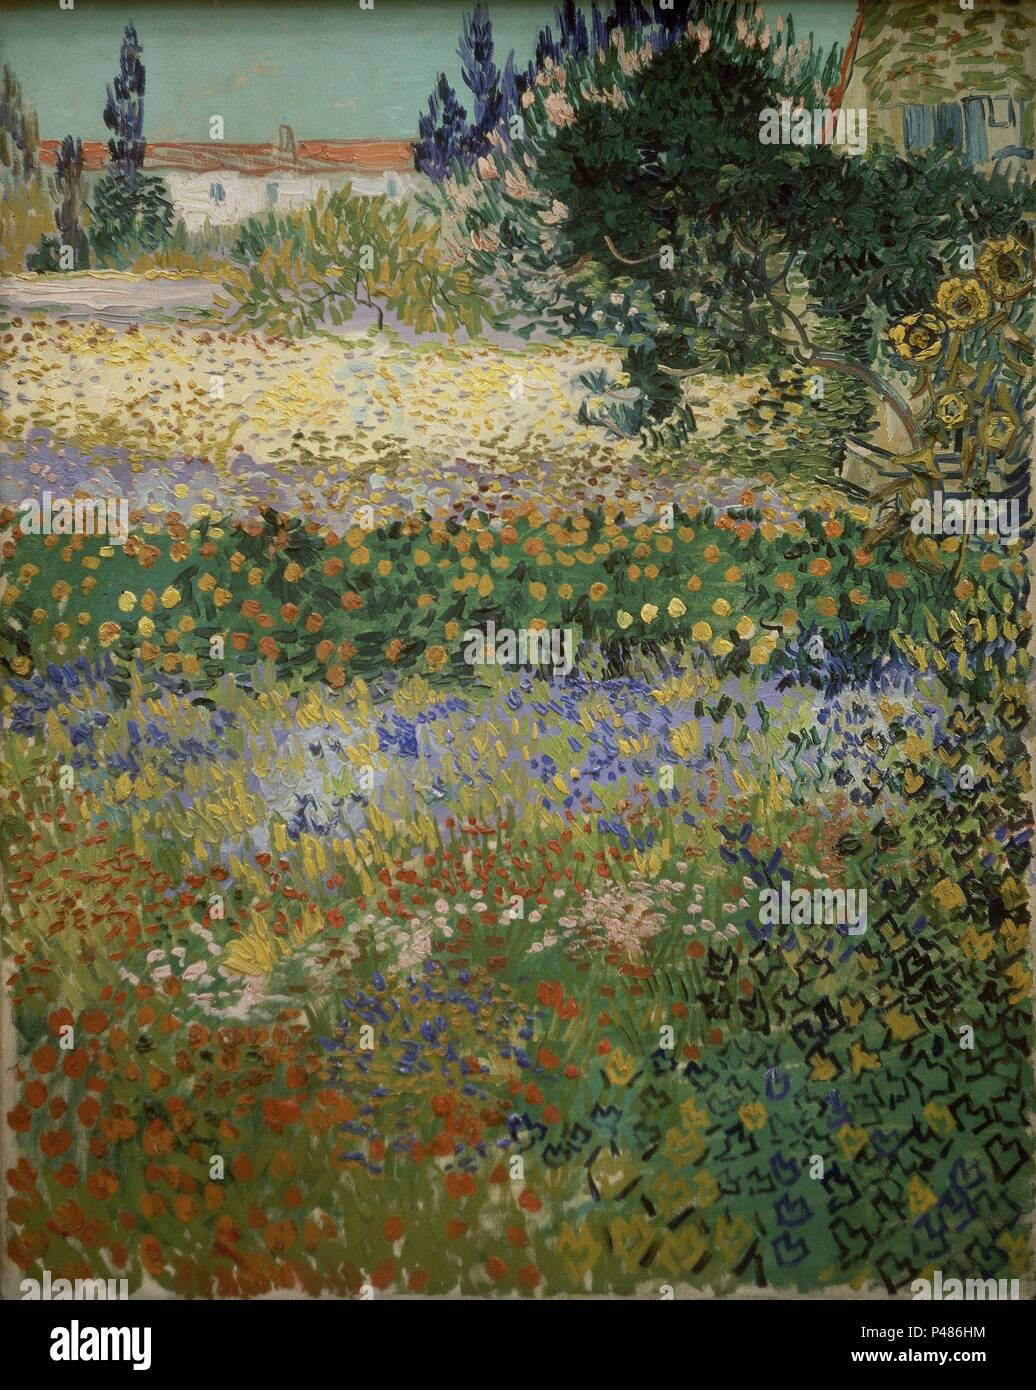 Garden In Bloom, Arles   1888   Oil On Canvas   92x73 Cm. Author: Vincent  Van Gogh (1853 1890). Location: METROPOLITAN MUSEUM OF ART, NEW YORK.